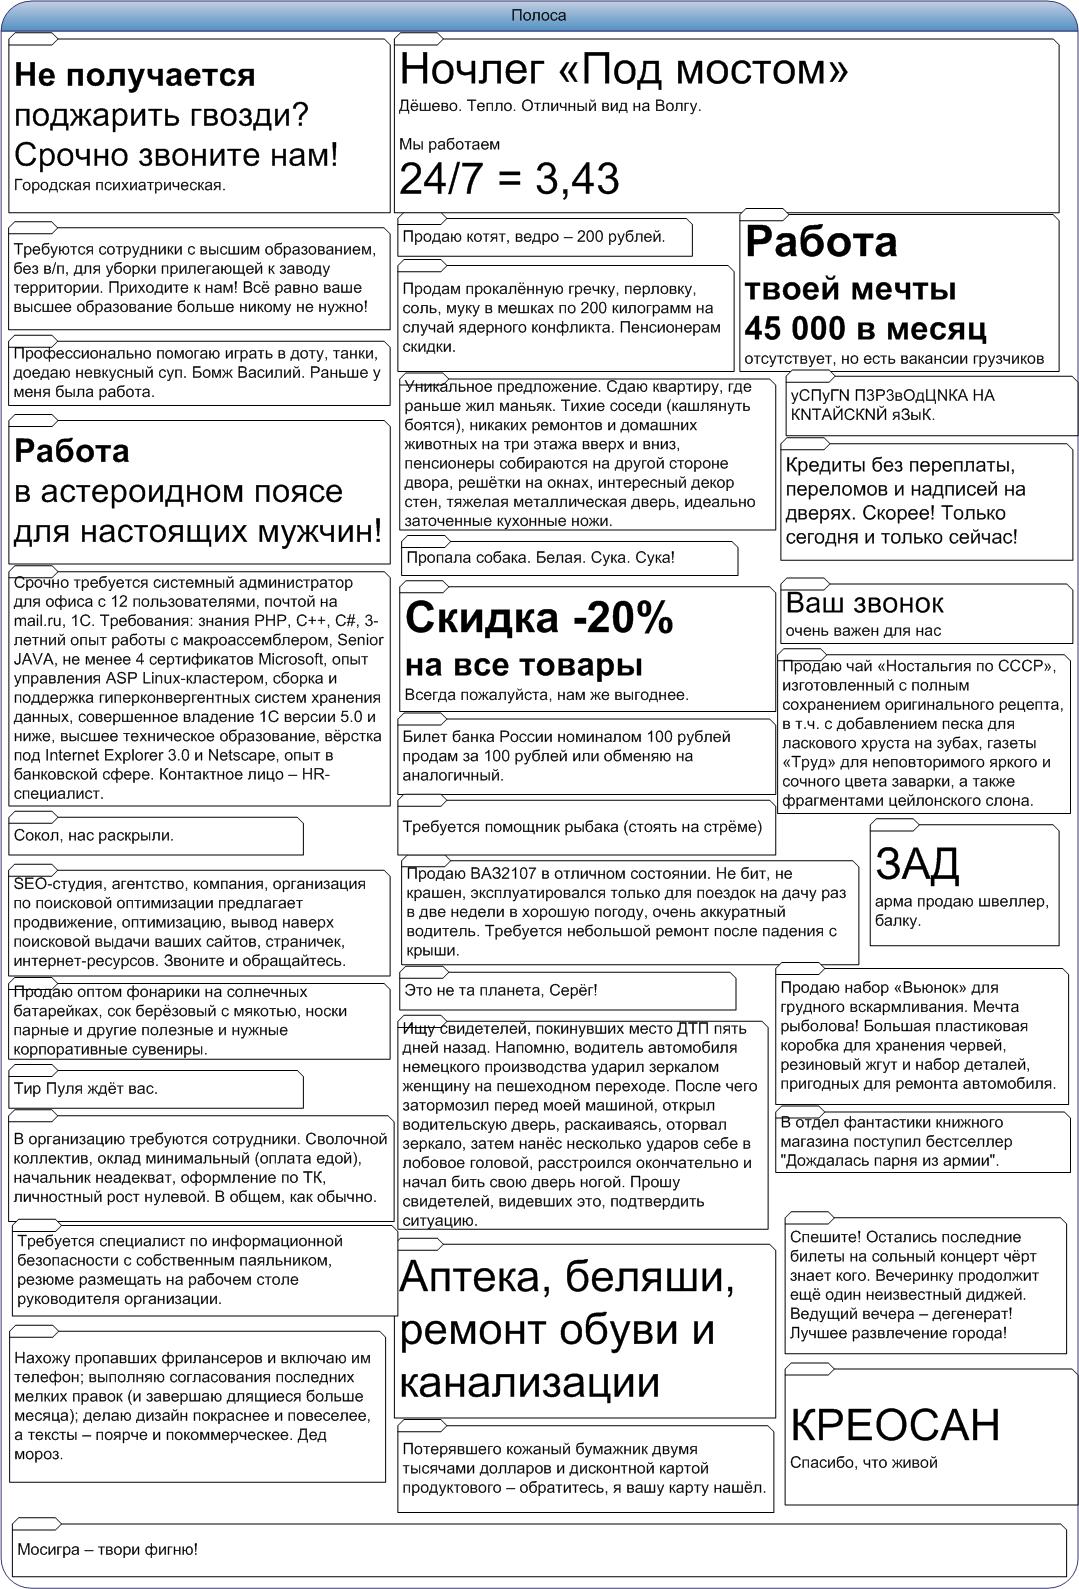 Троллим бумажную газету - 7